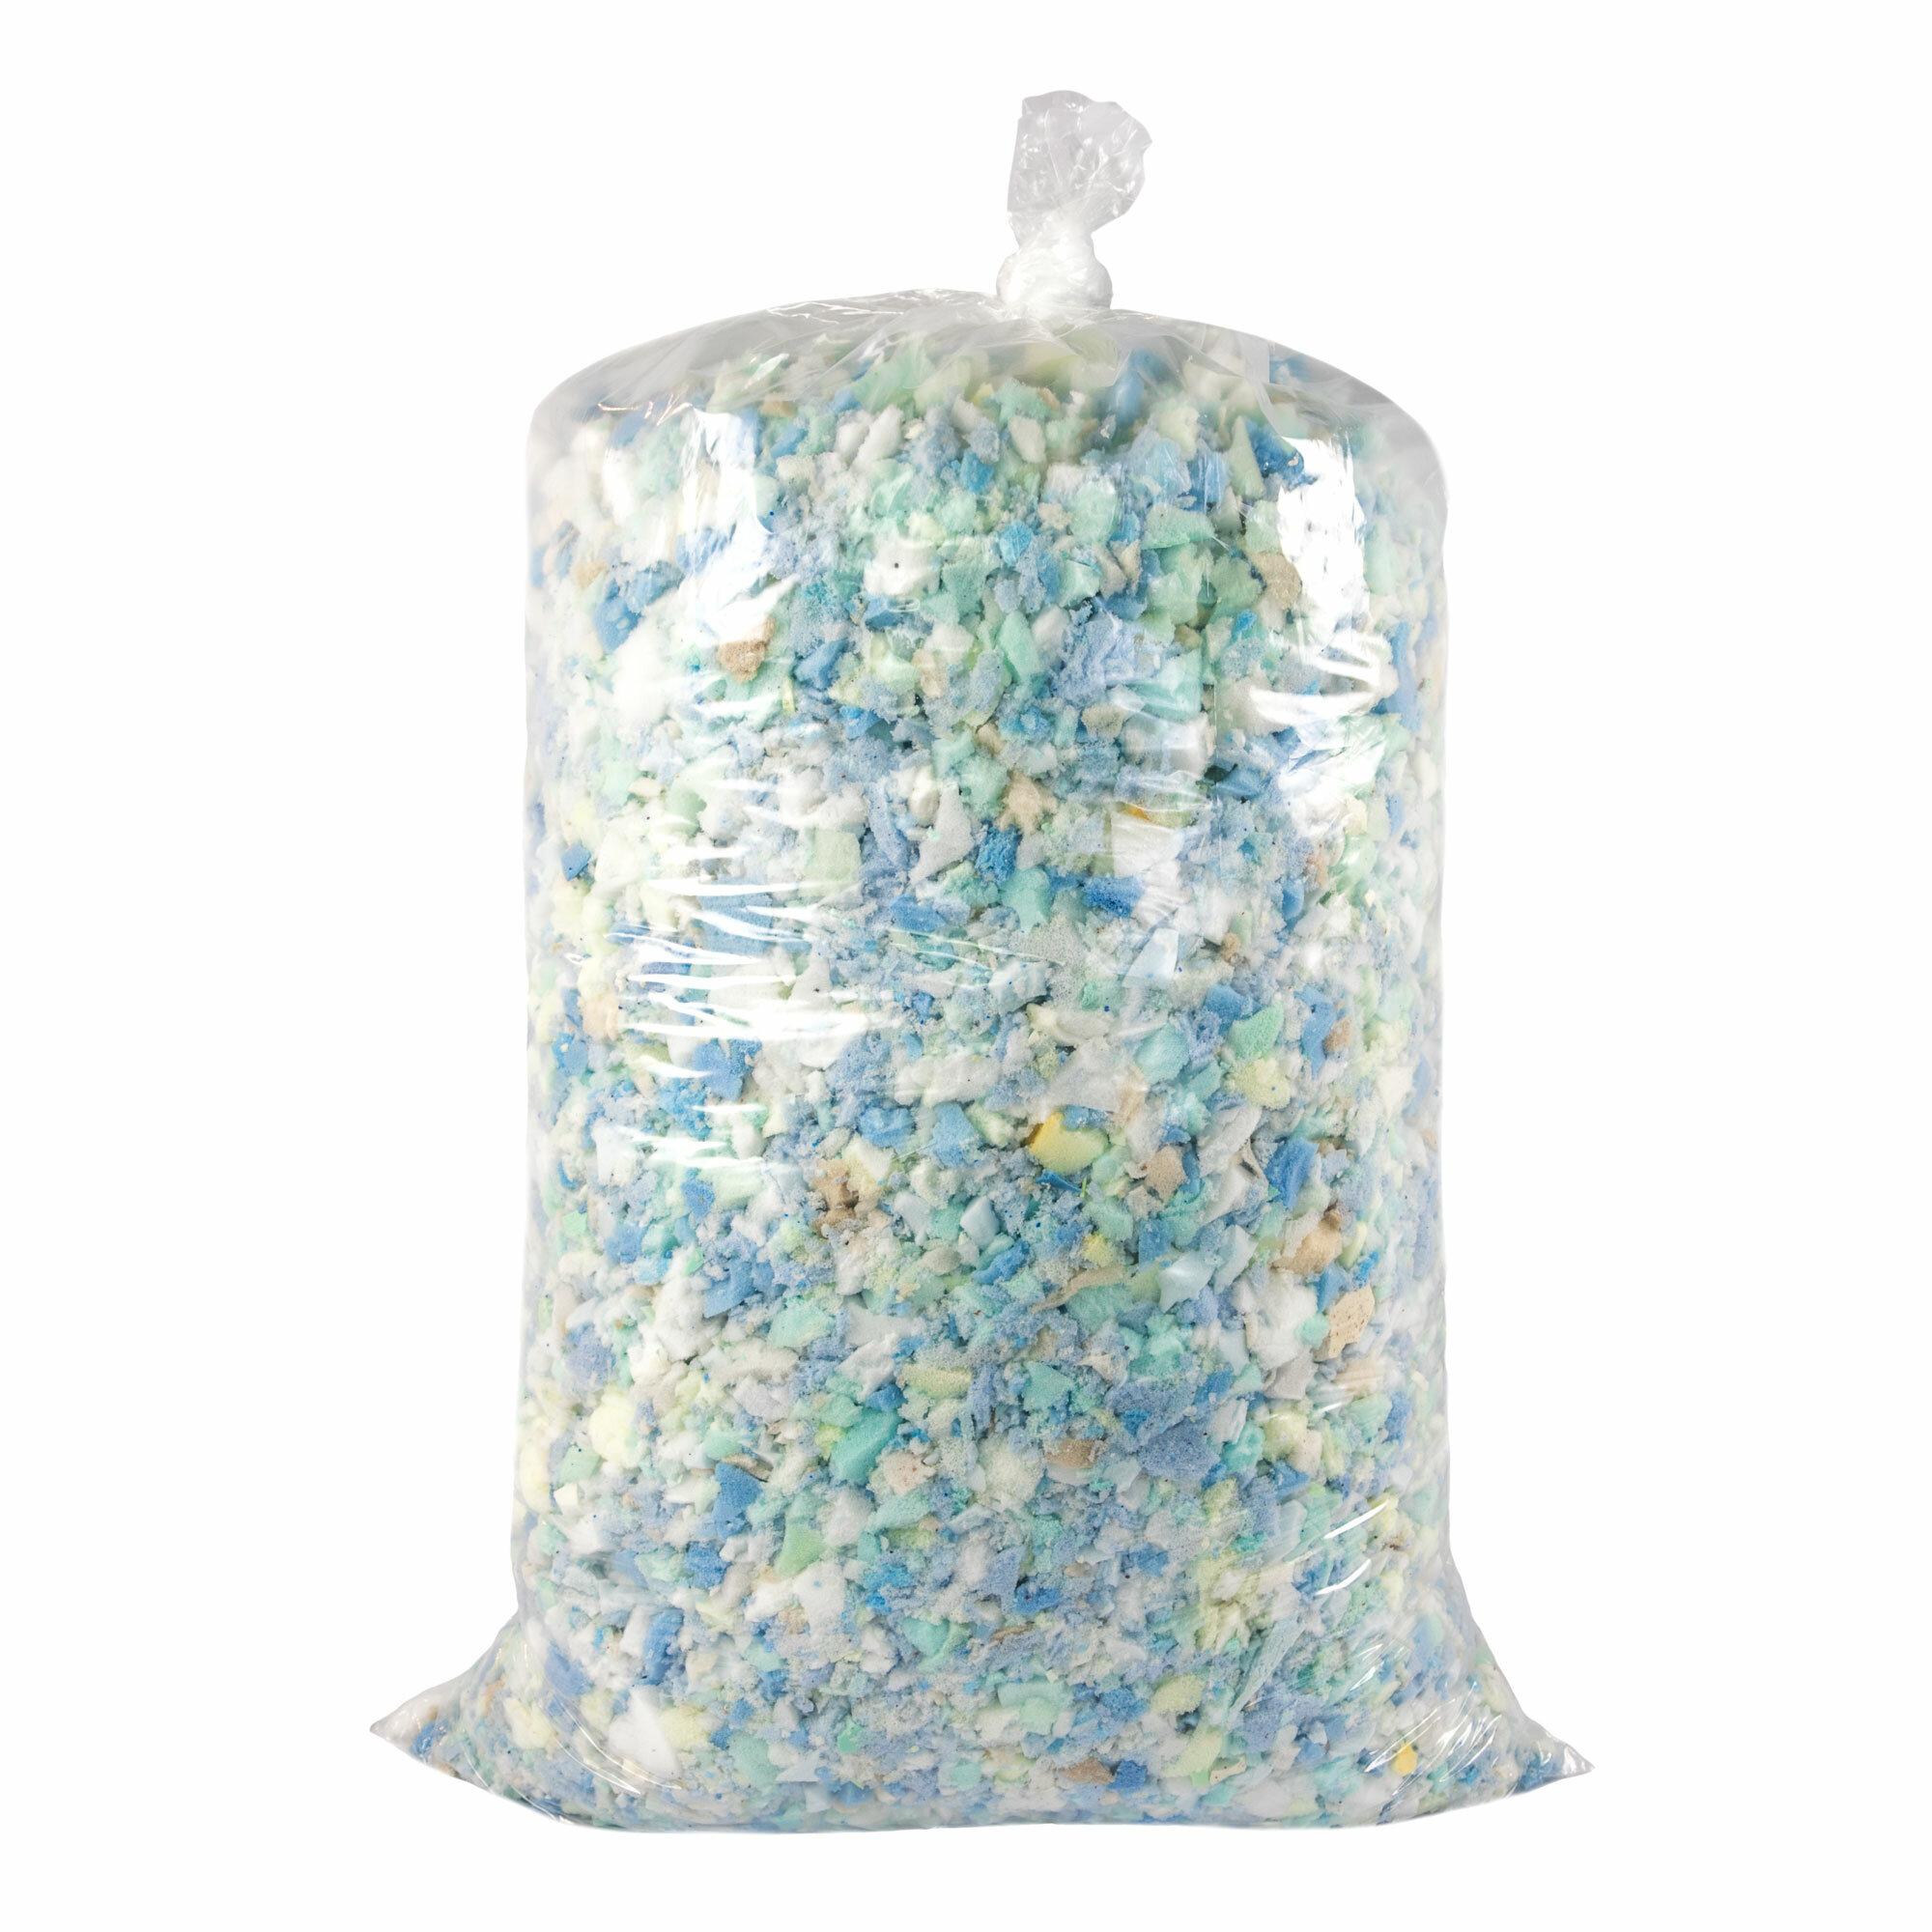 Alwyn Home Shredded Memory Foam Bean Bag Small Replacement Fill Wayfair